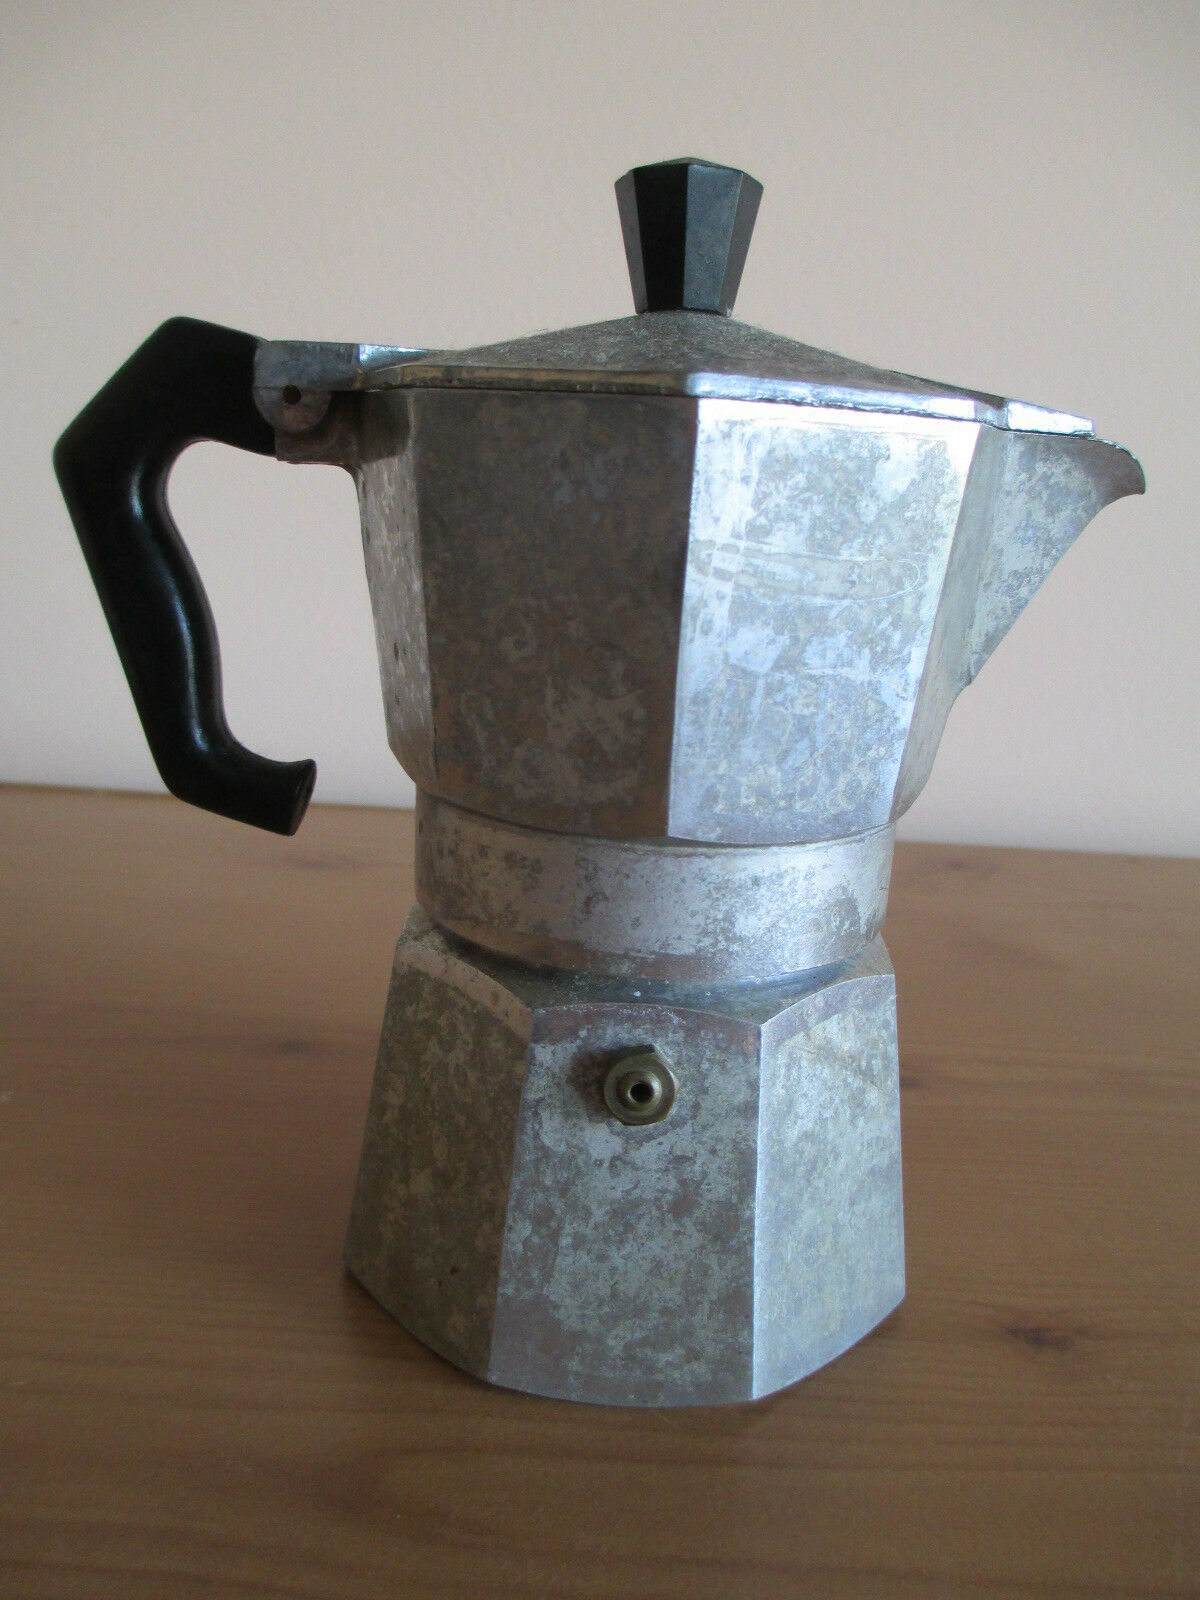 VTG ALUMINUM MORENITA ESPRESSO COFFEE MAKER, MADE IN ITALY image 3